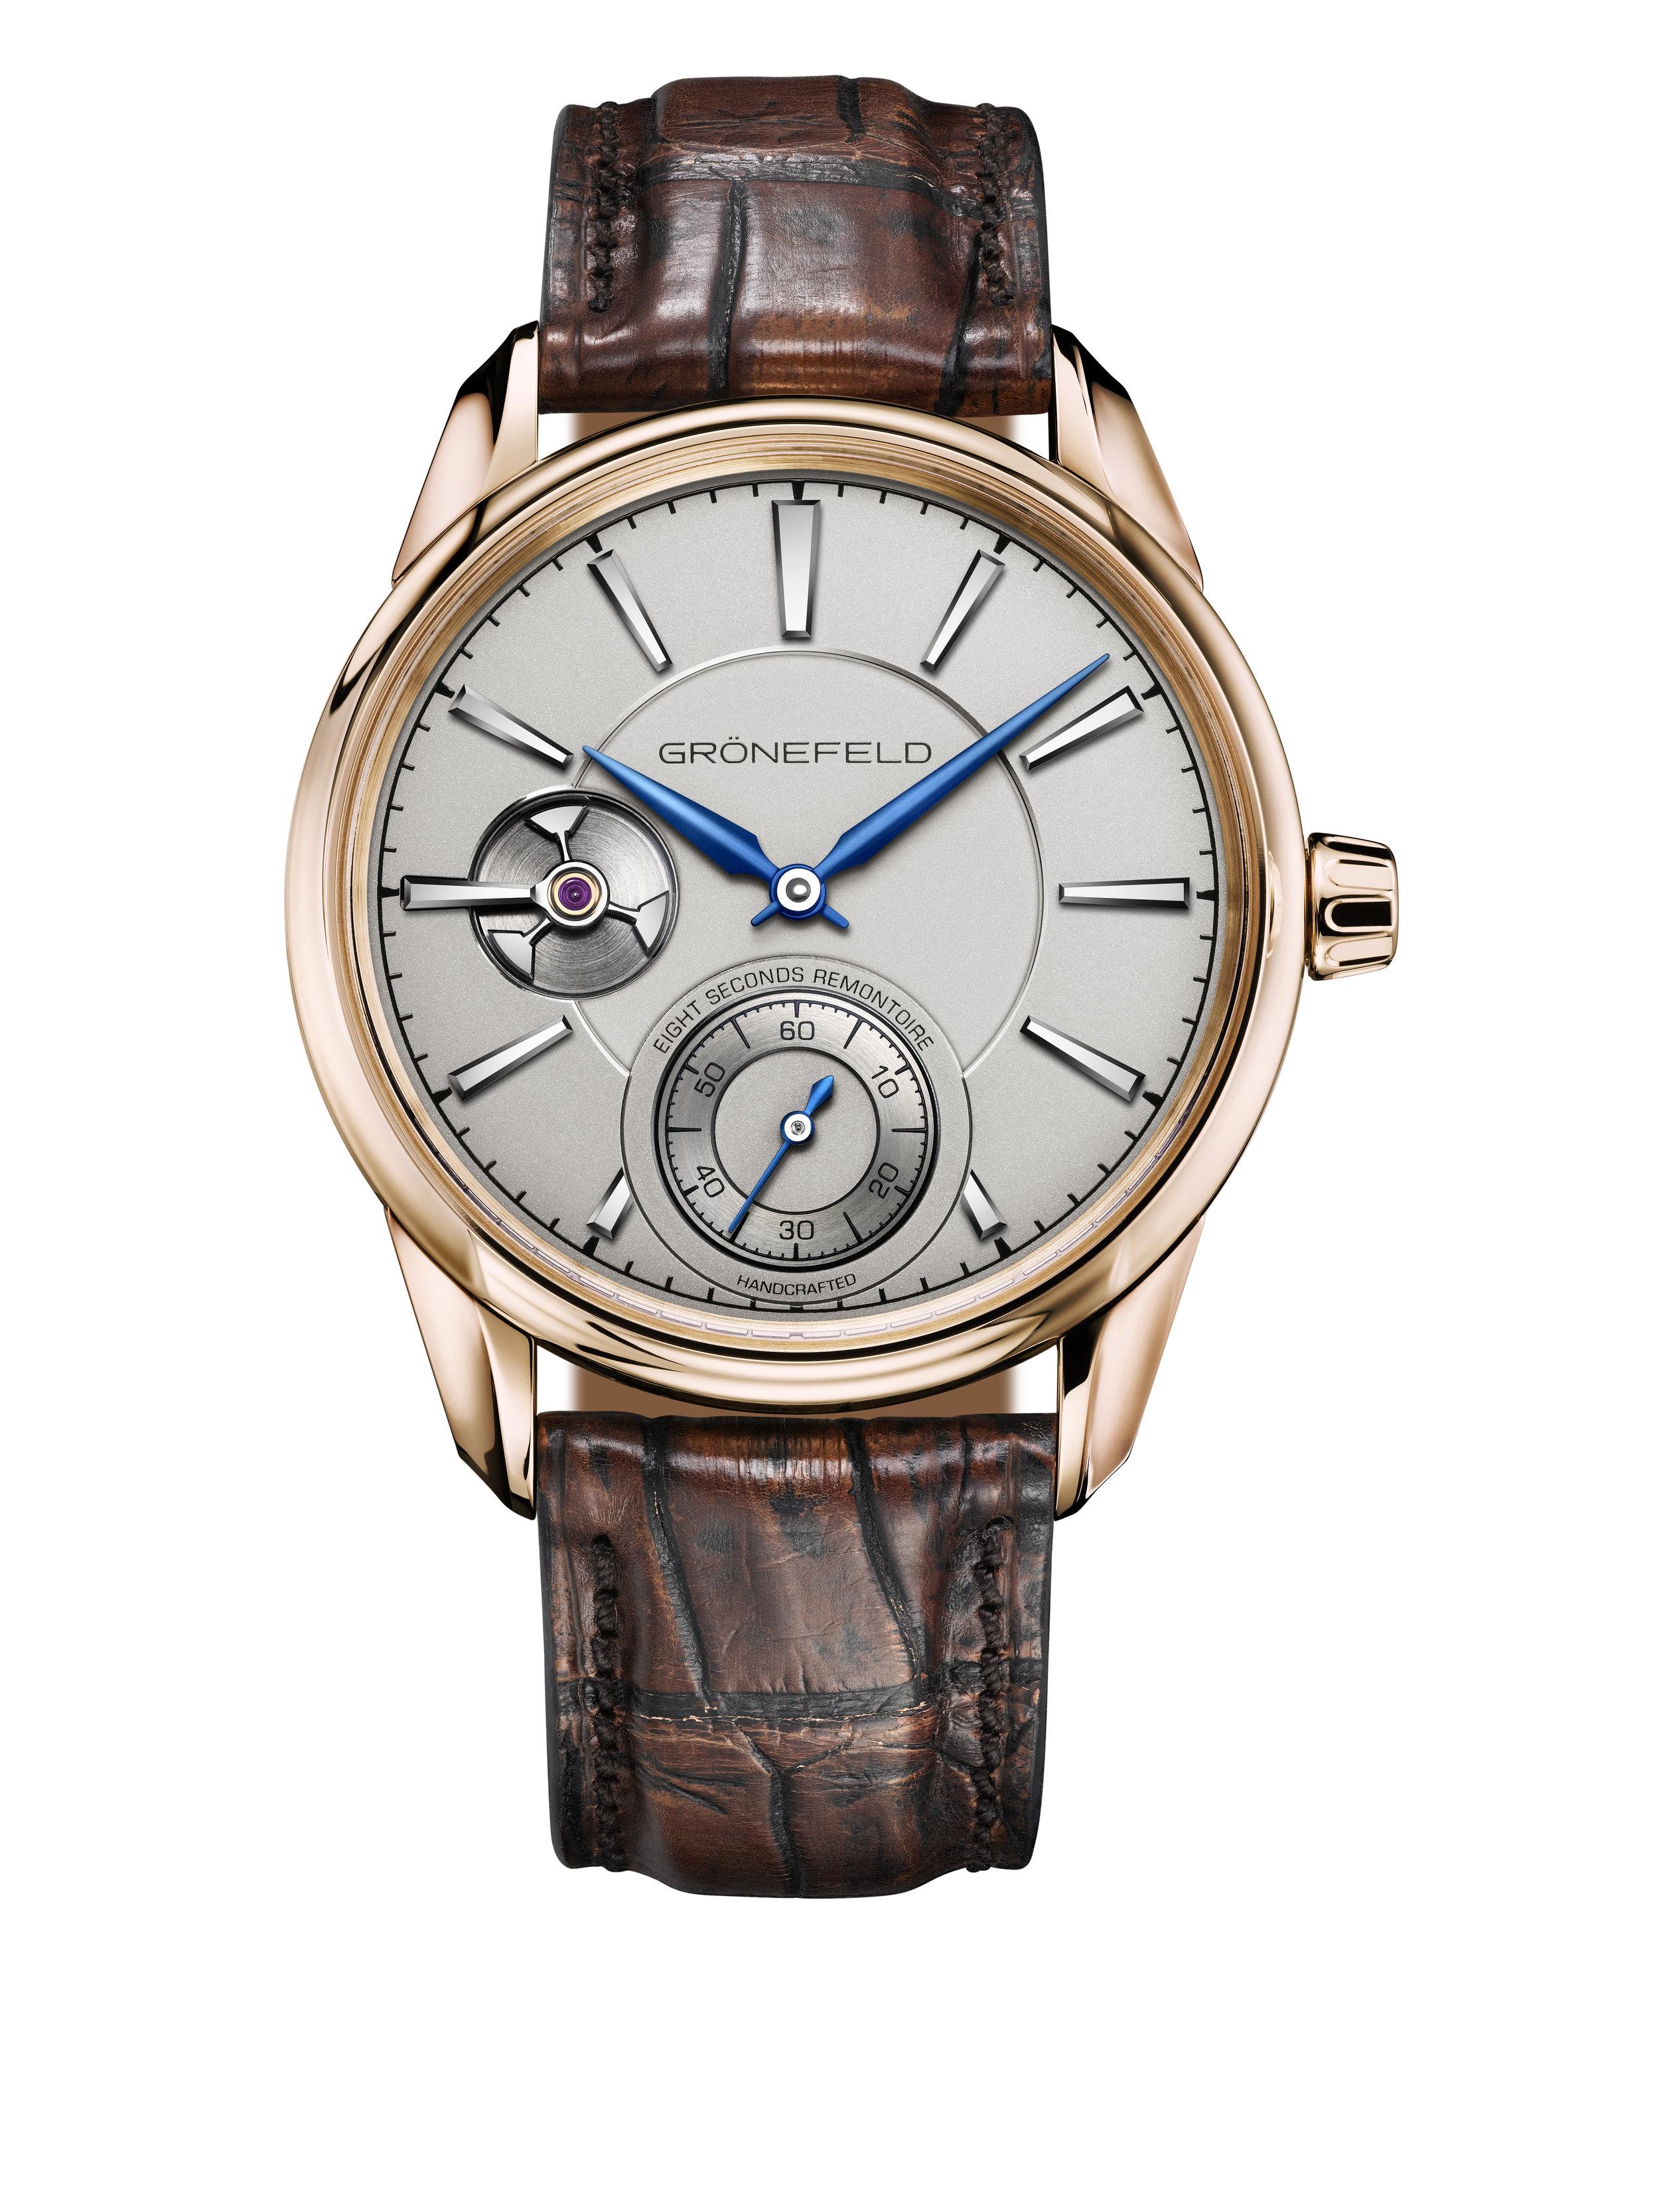 Men's Watch Prize: